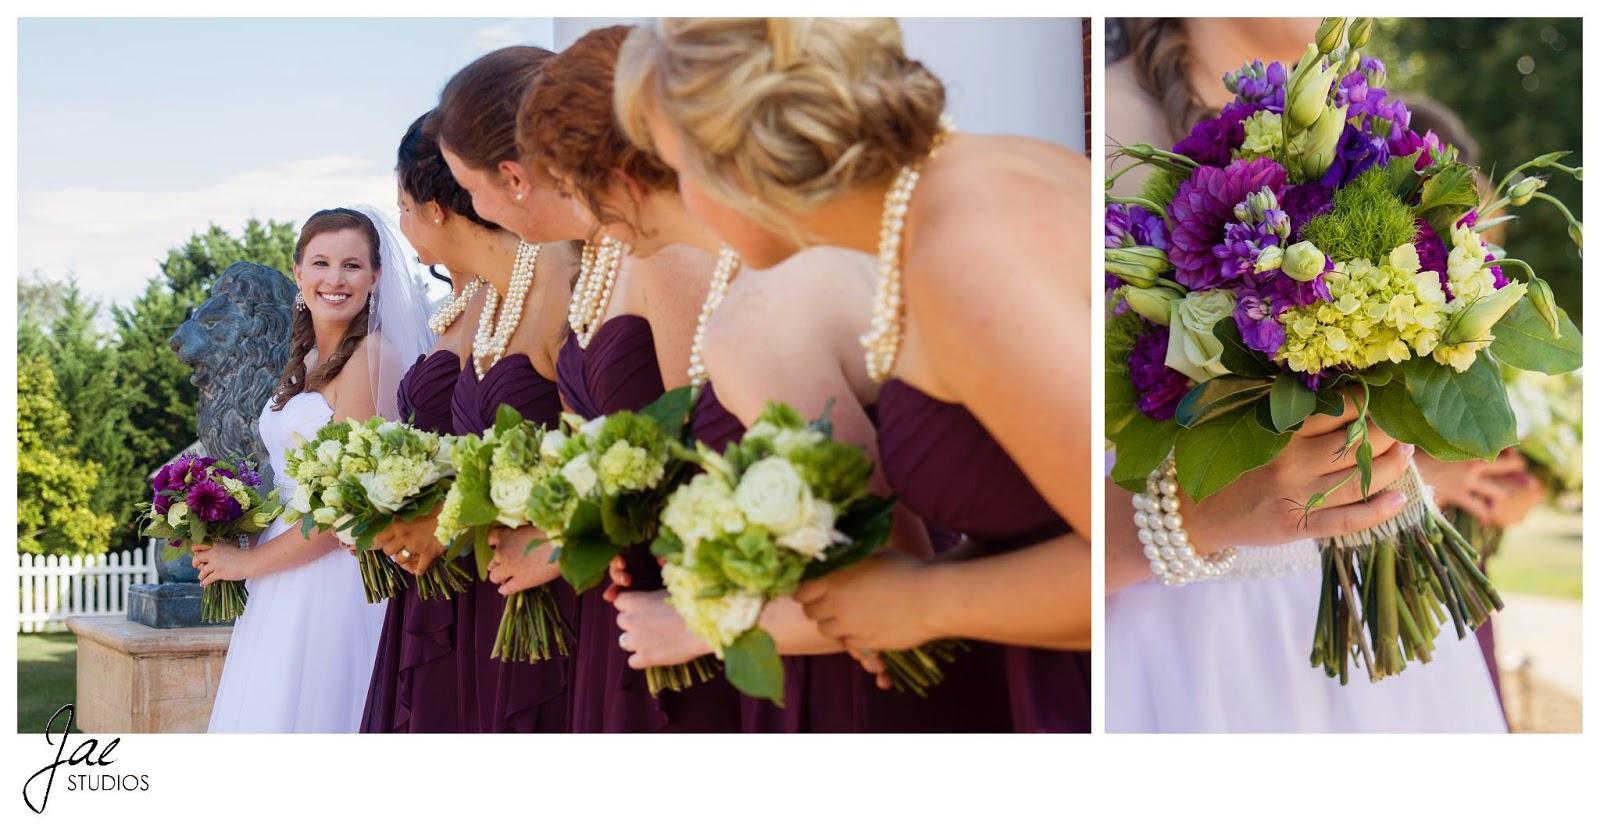 Jonathan and Julie, Bird cage, West Manor Estate, Wedding, Lynchburg, Virginia, Jae Studios, purple, bridesmaids, maid of honor, bouquet, pearls, blonde, brunette, red head, black hair